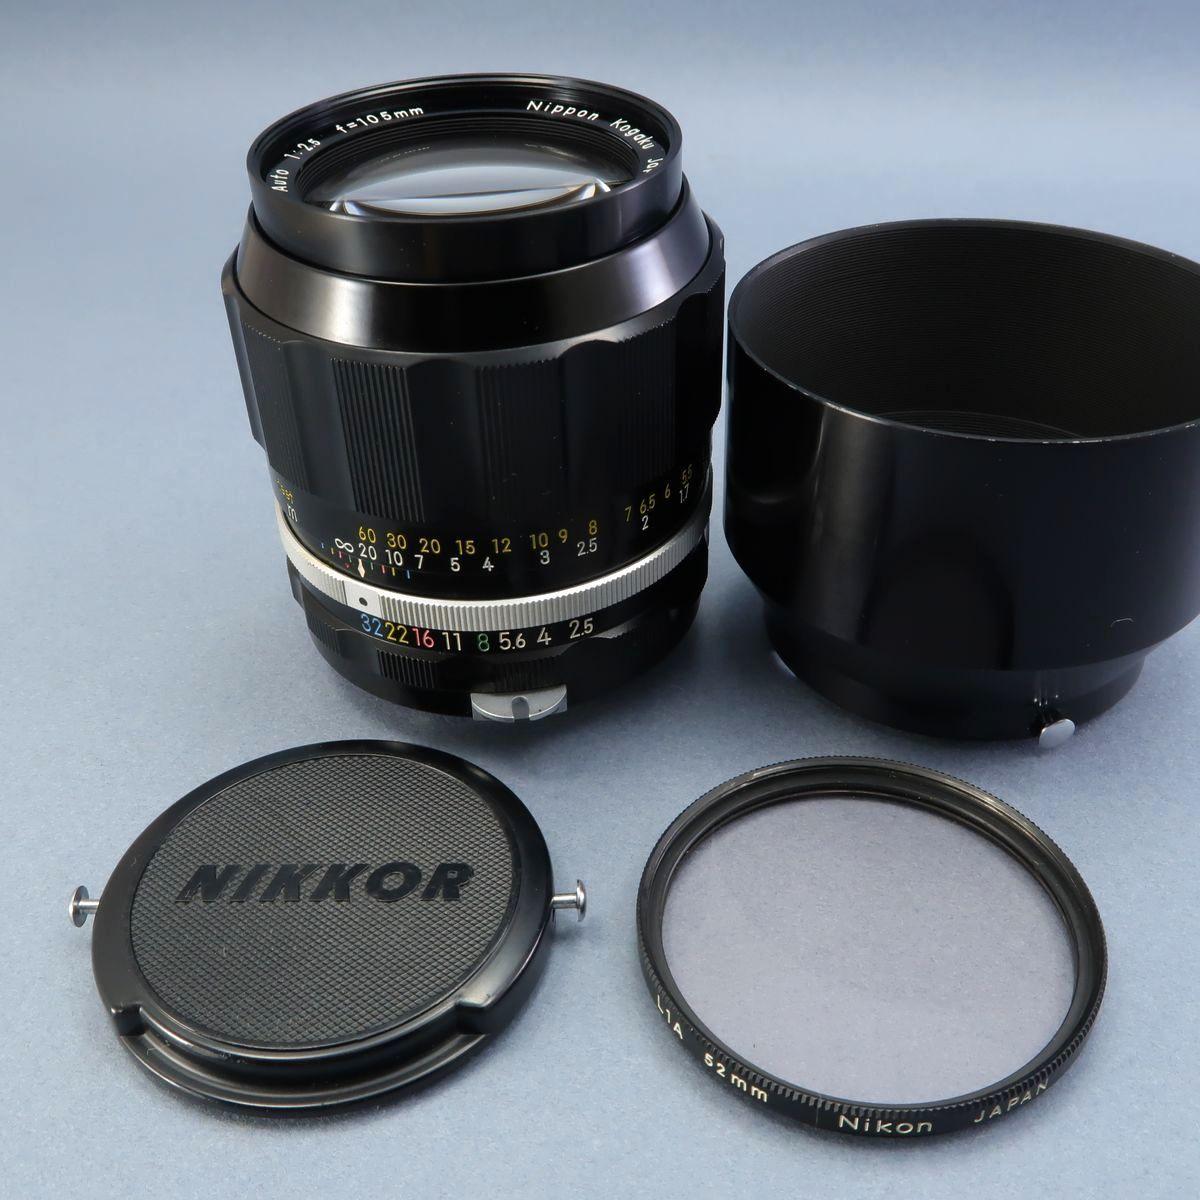 ★Nikon F フィルムカメラ 本体 レンズ Nikkor-Auto 105mm F 2.5 28mm F 3.5 NIKKOR-H Auto 1:3.5 f=2.8cm FTN 付属多数 ジャンク_画像8